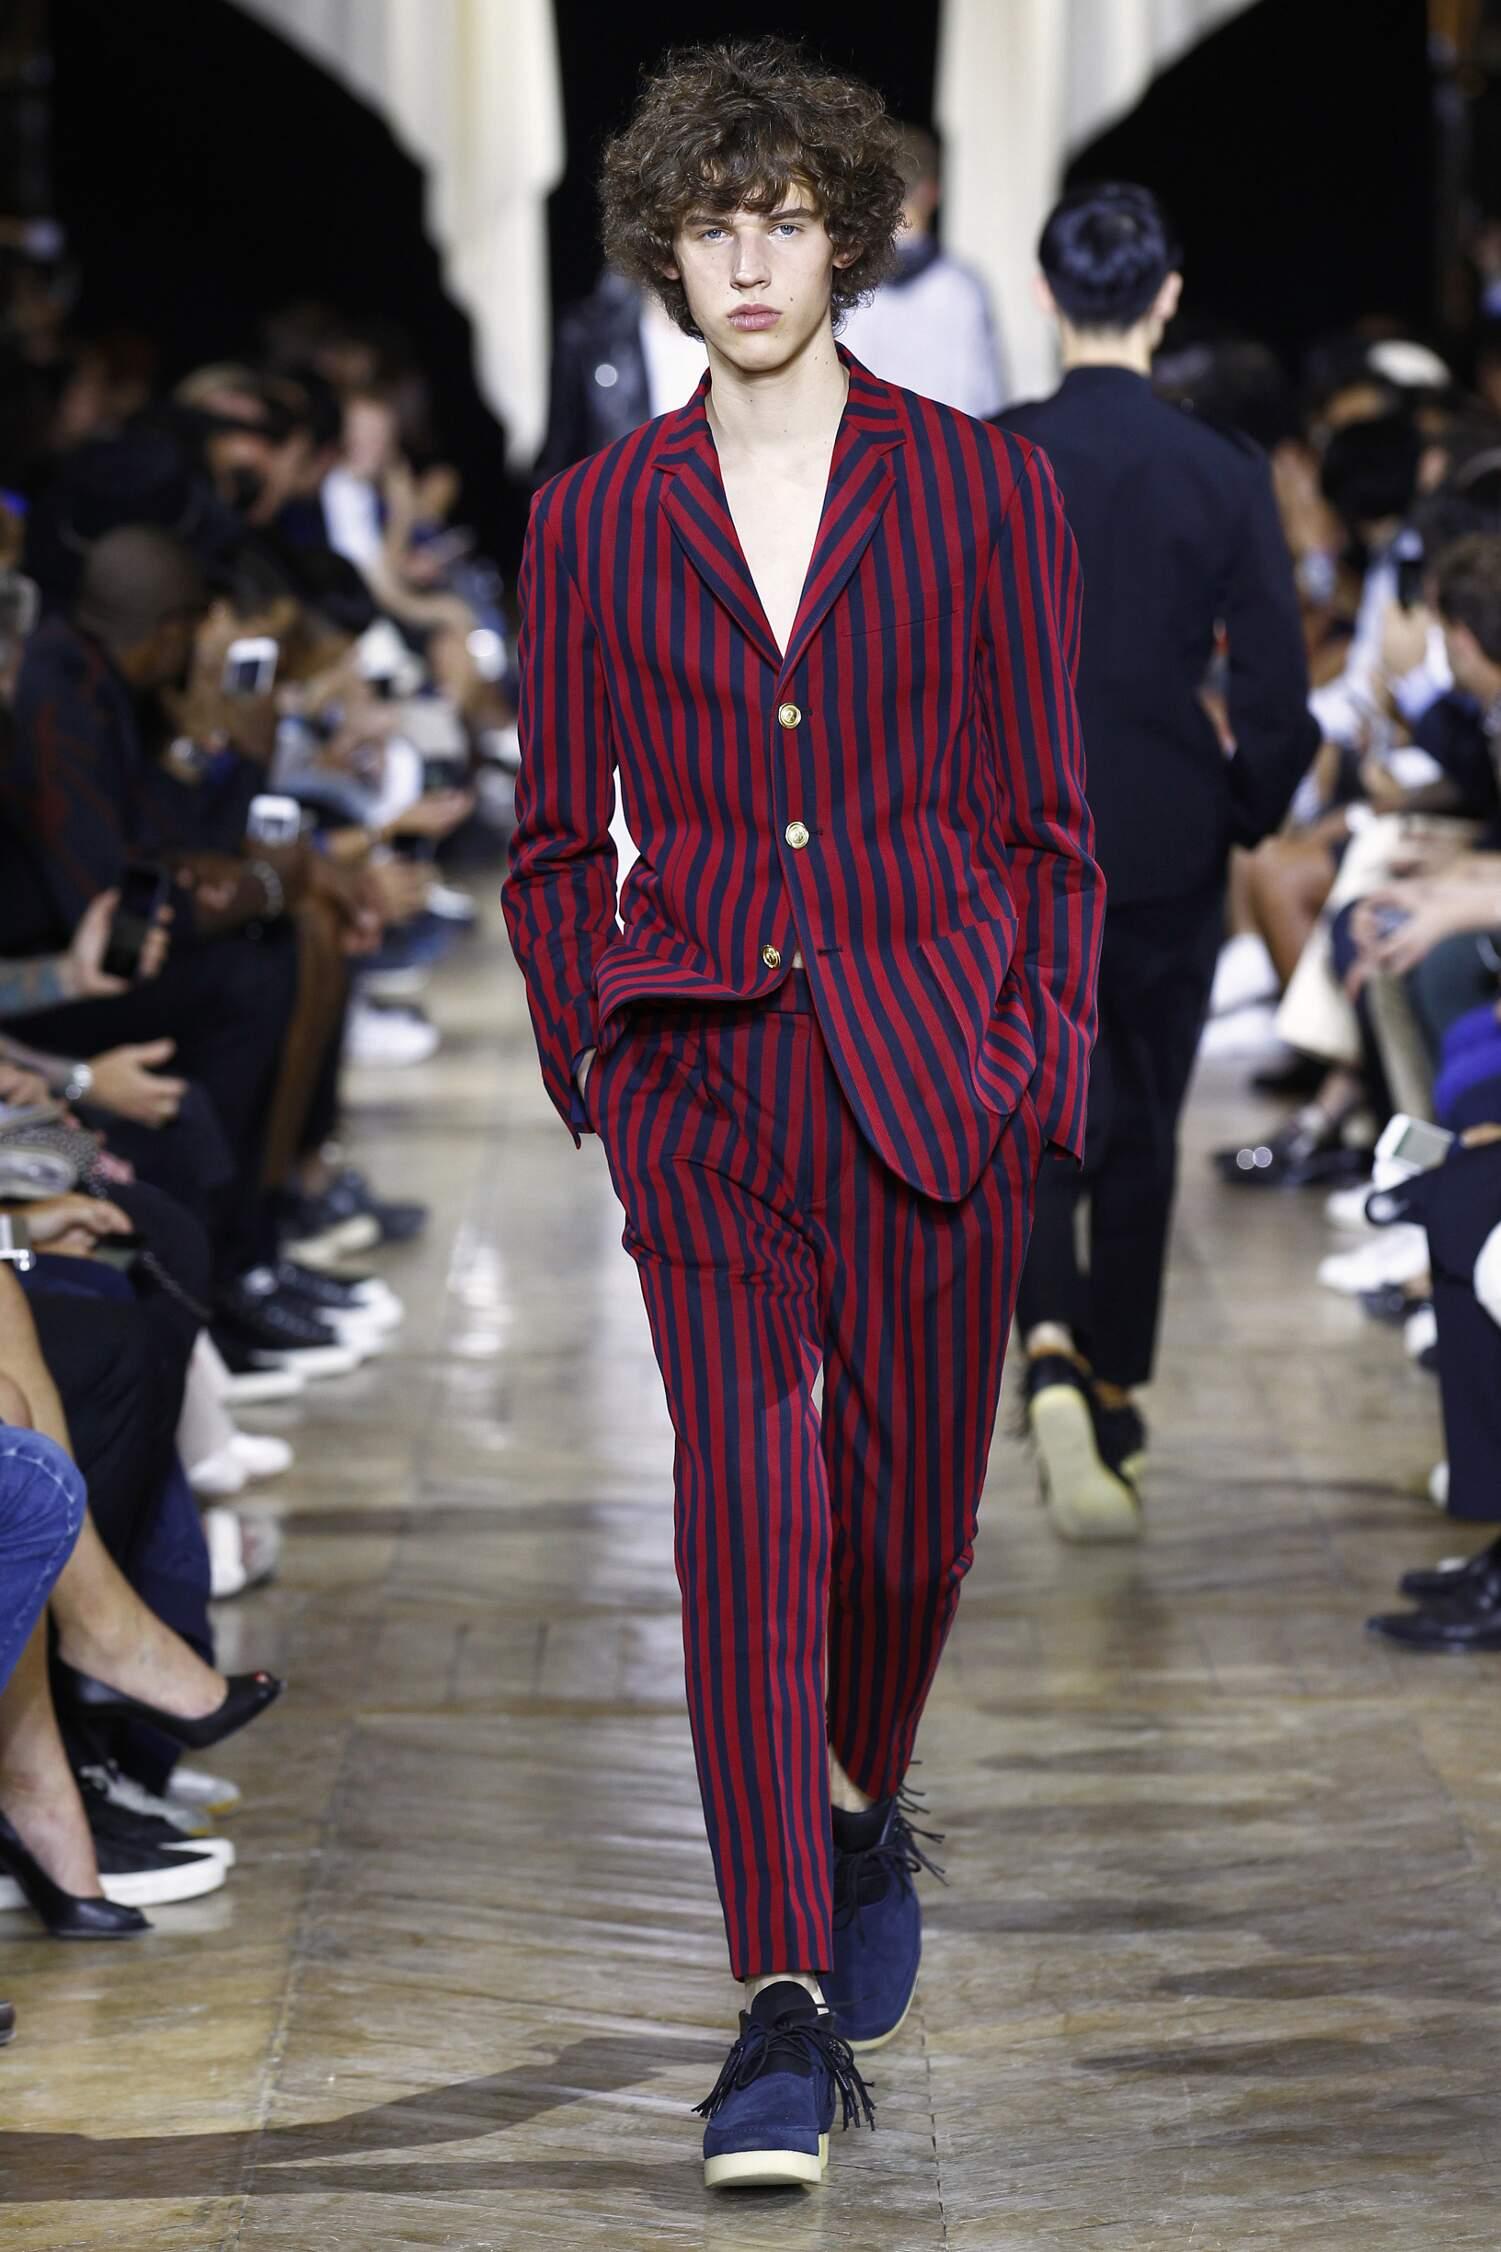 2016 Fashion Man Model Phillip Lim Collection Catwalk